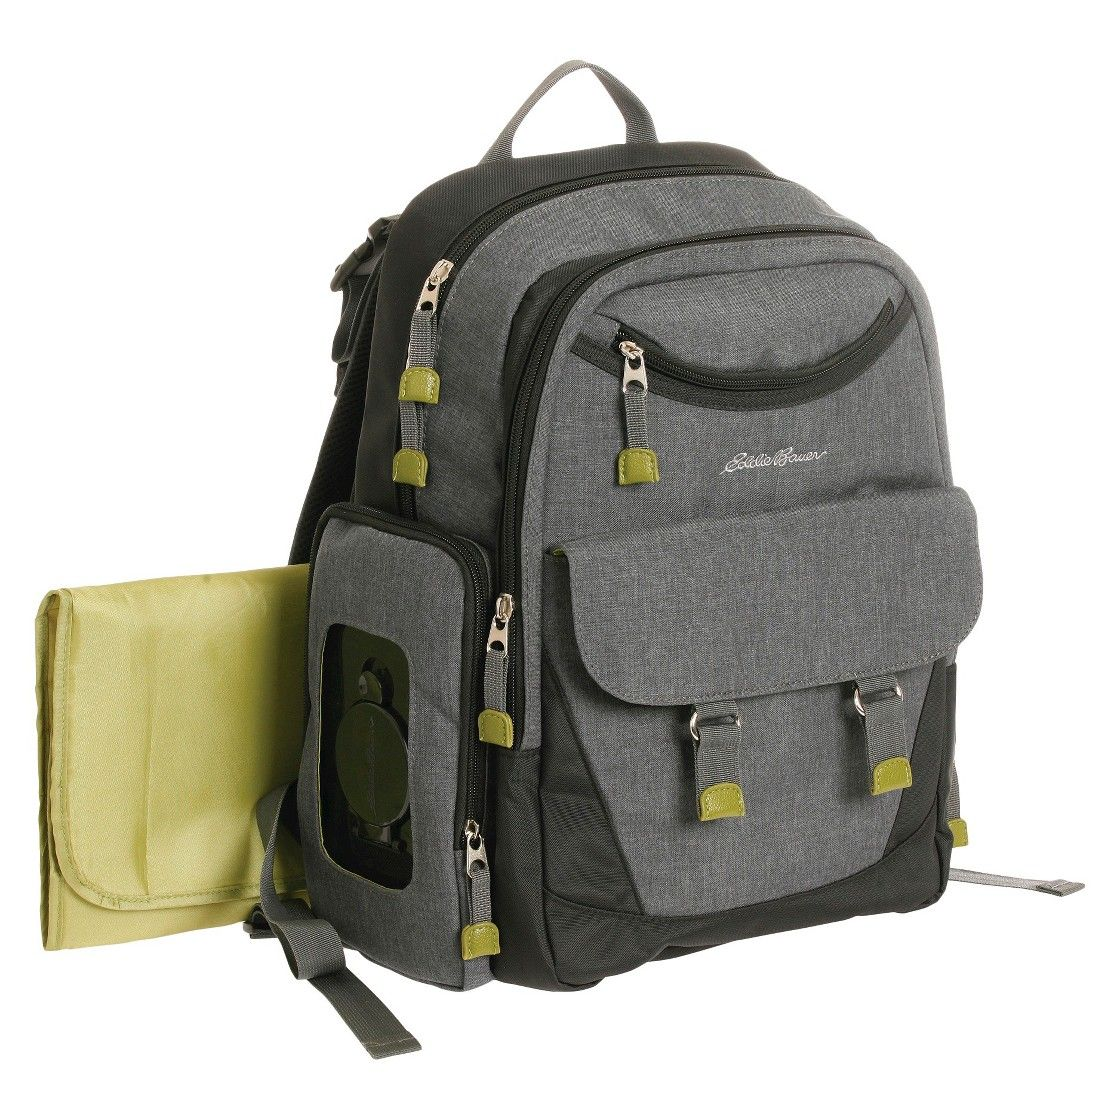 Eddie bauer first adventure benson backpack diaper bag